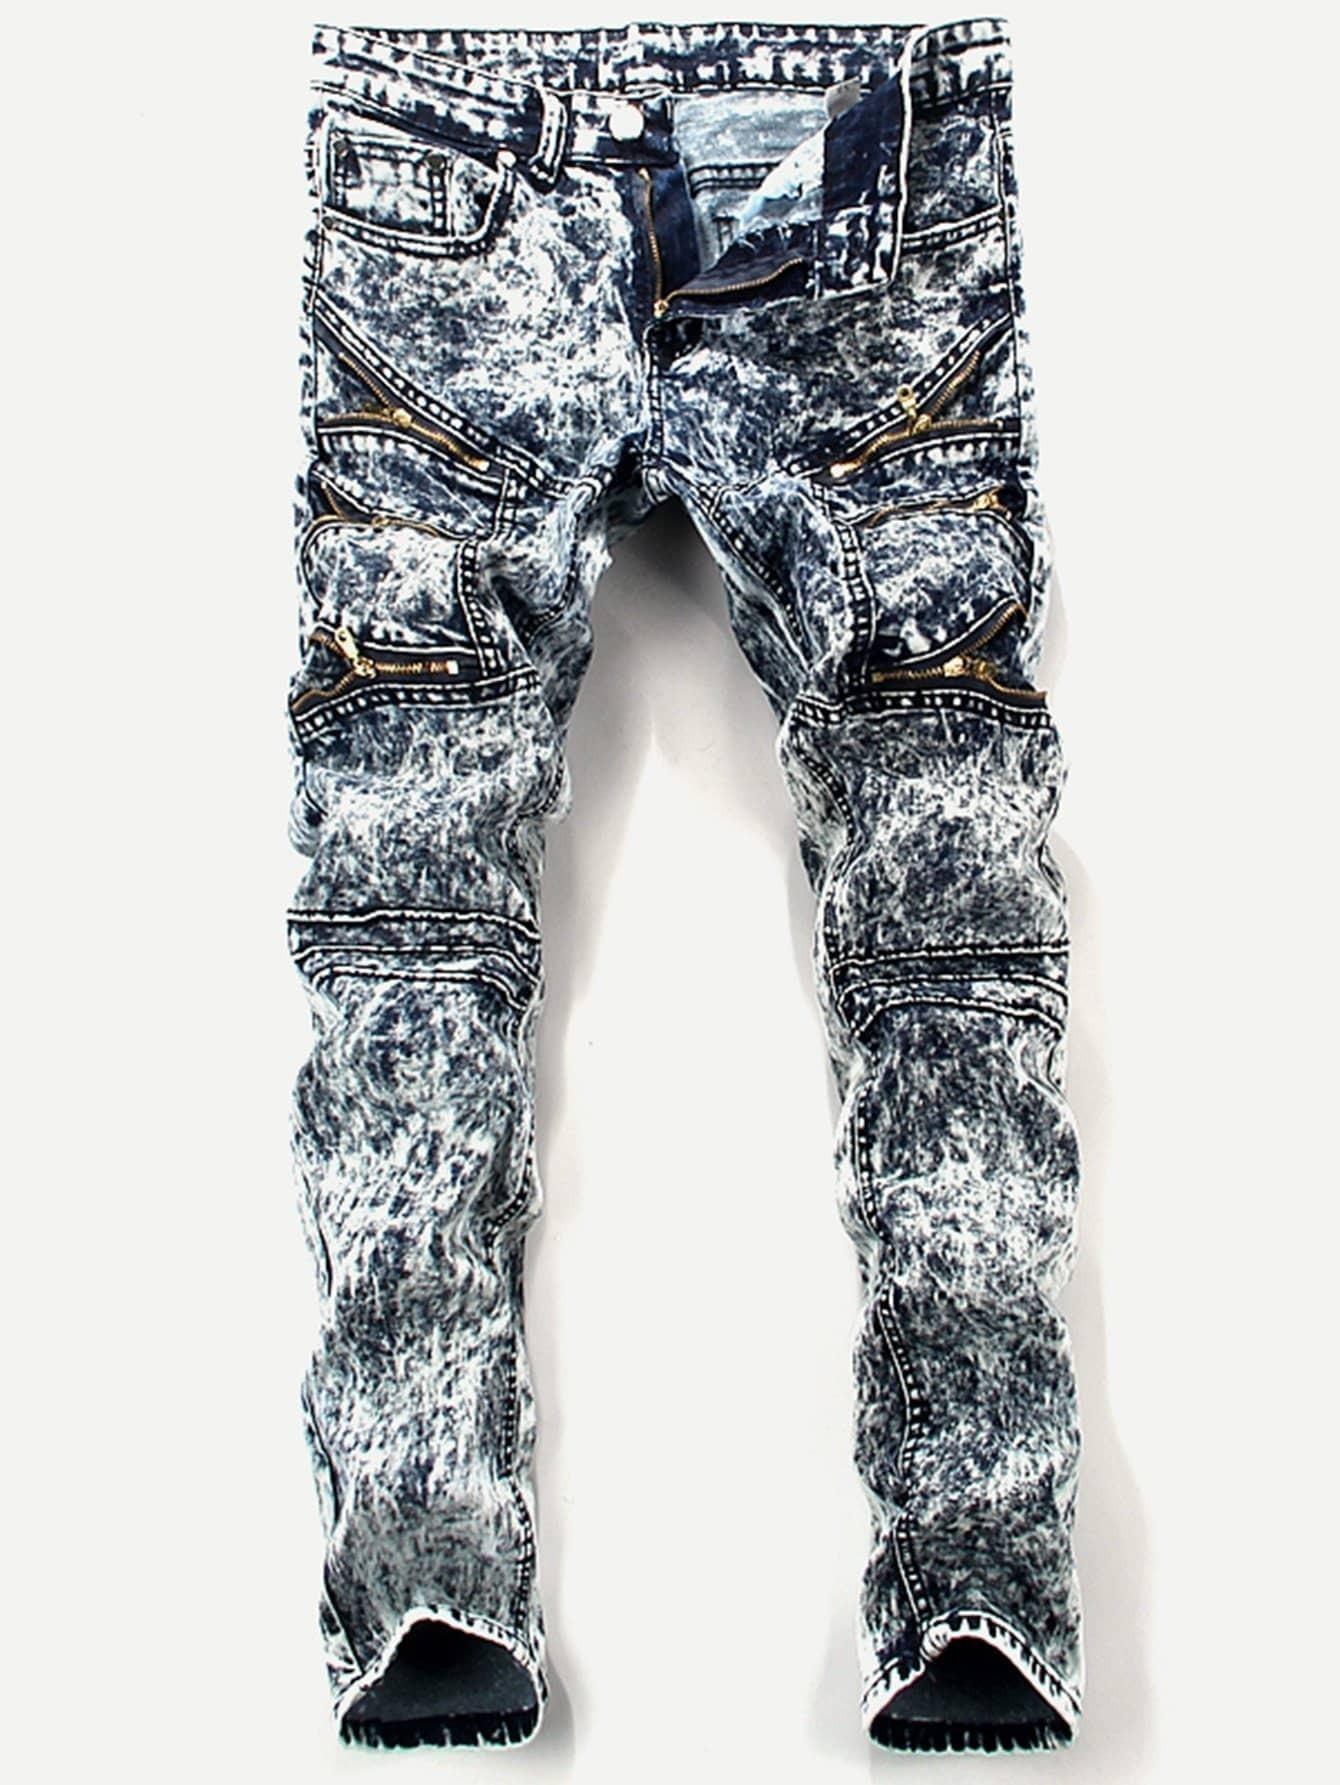 Men Zip Decoration Tie Dye Skinny Jeans men s classic jeans straight full length casual hip hop zip pocket biker jeans fashion slim skinny jeans men big sizes 29 42